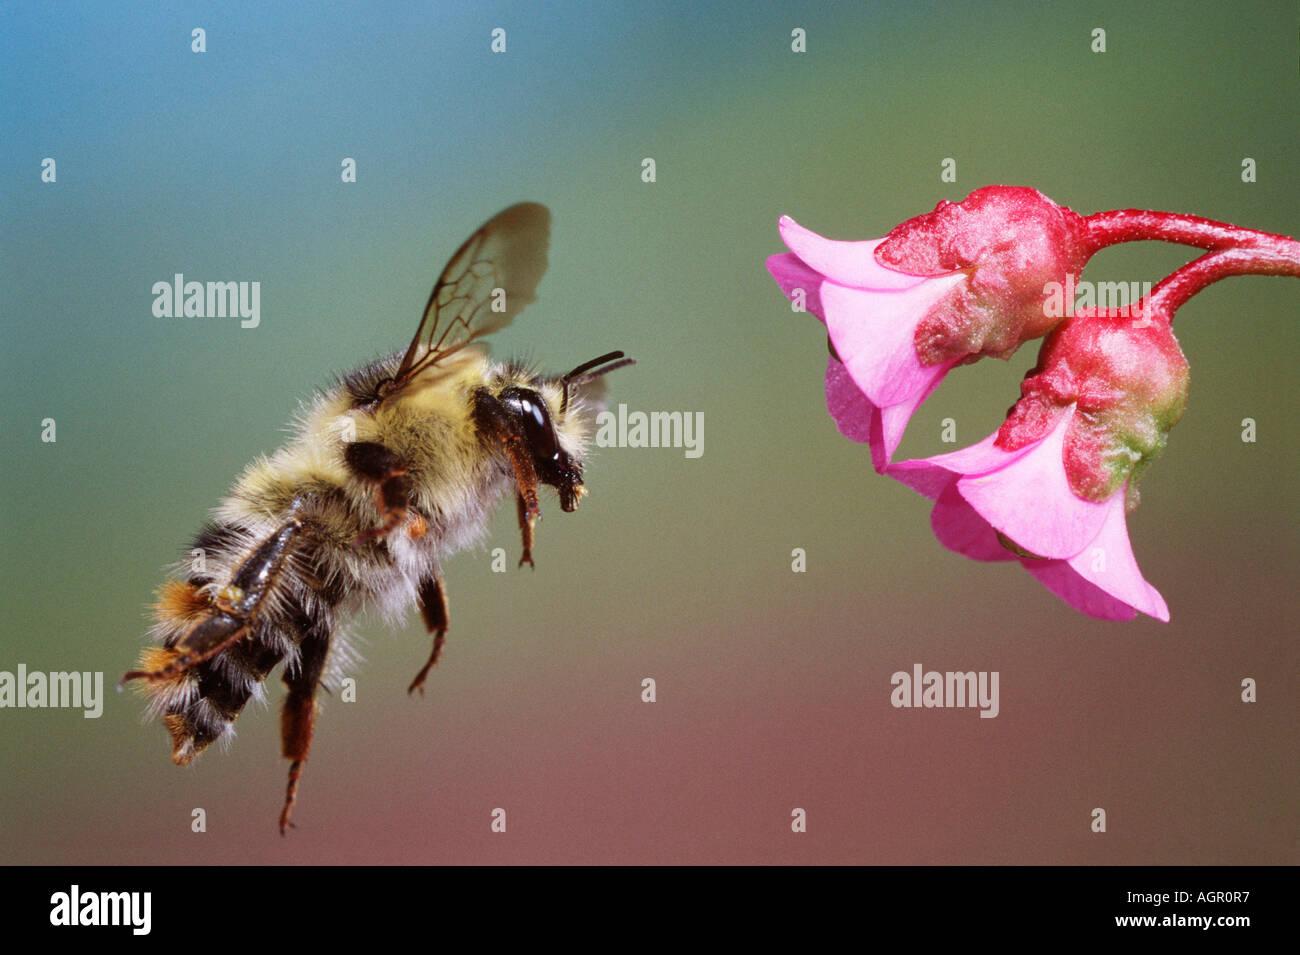 Cullum's Bumblebee / Cullumanus-Hummel - Stock Image